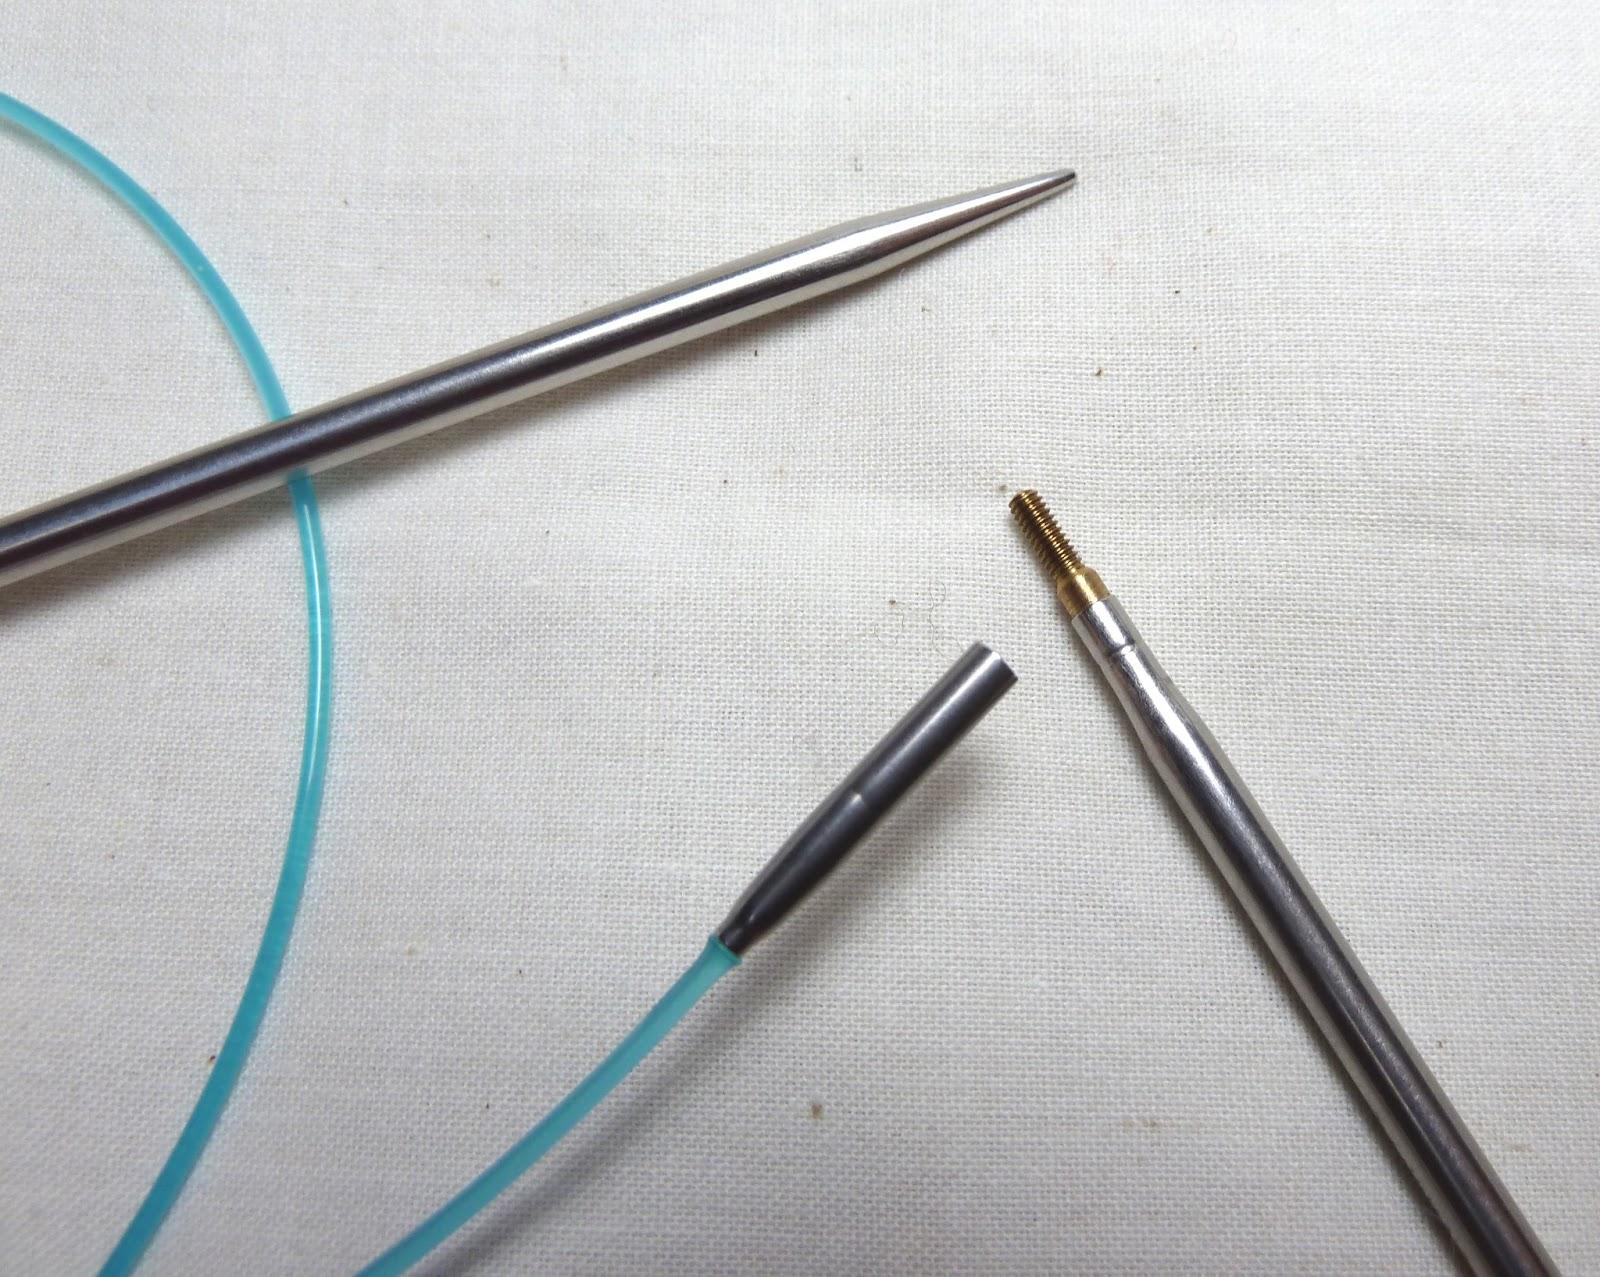 Knitting On 4 Needles : Circular knitting needle comparison